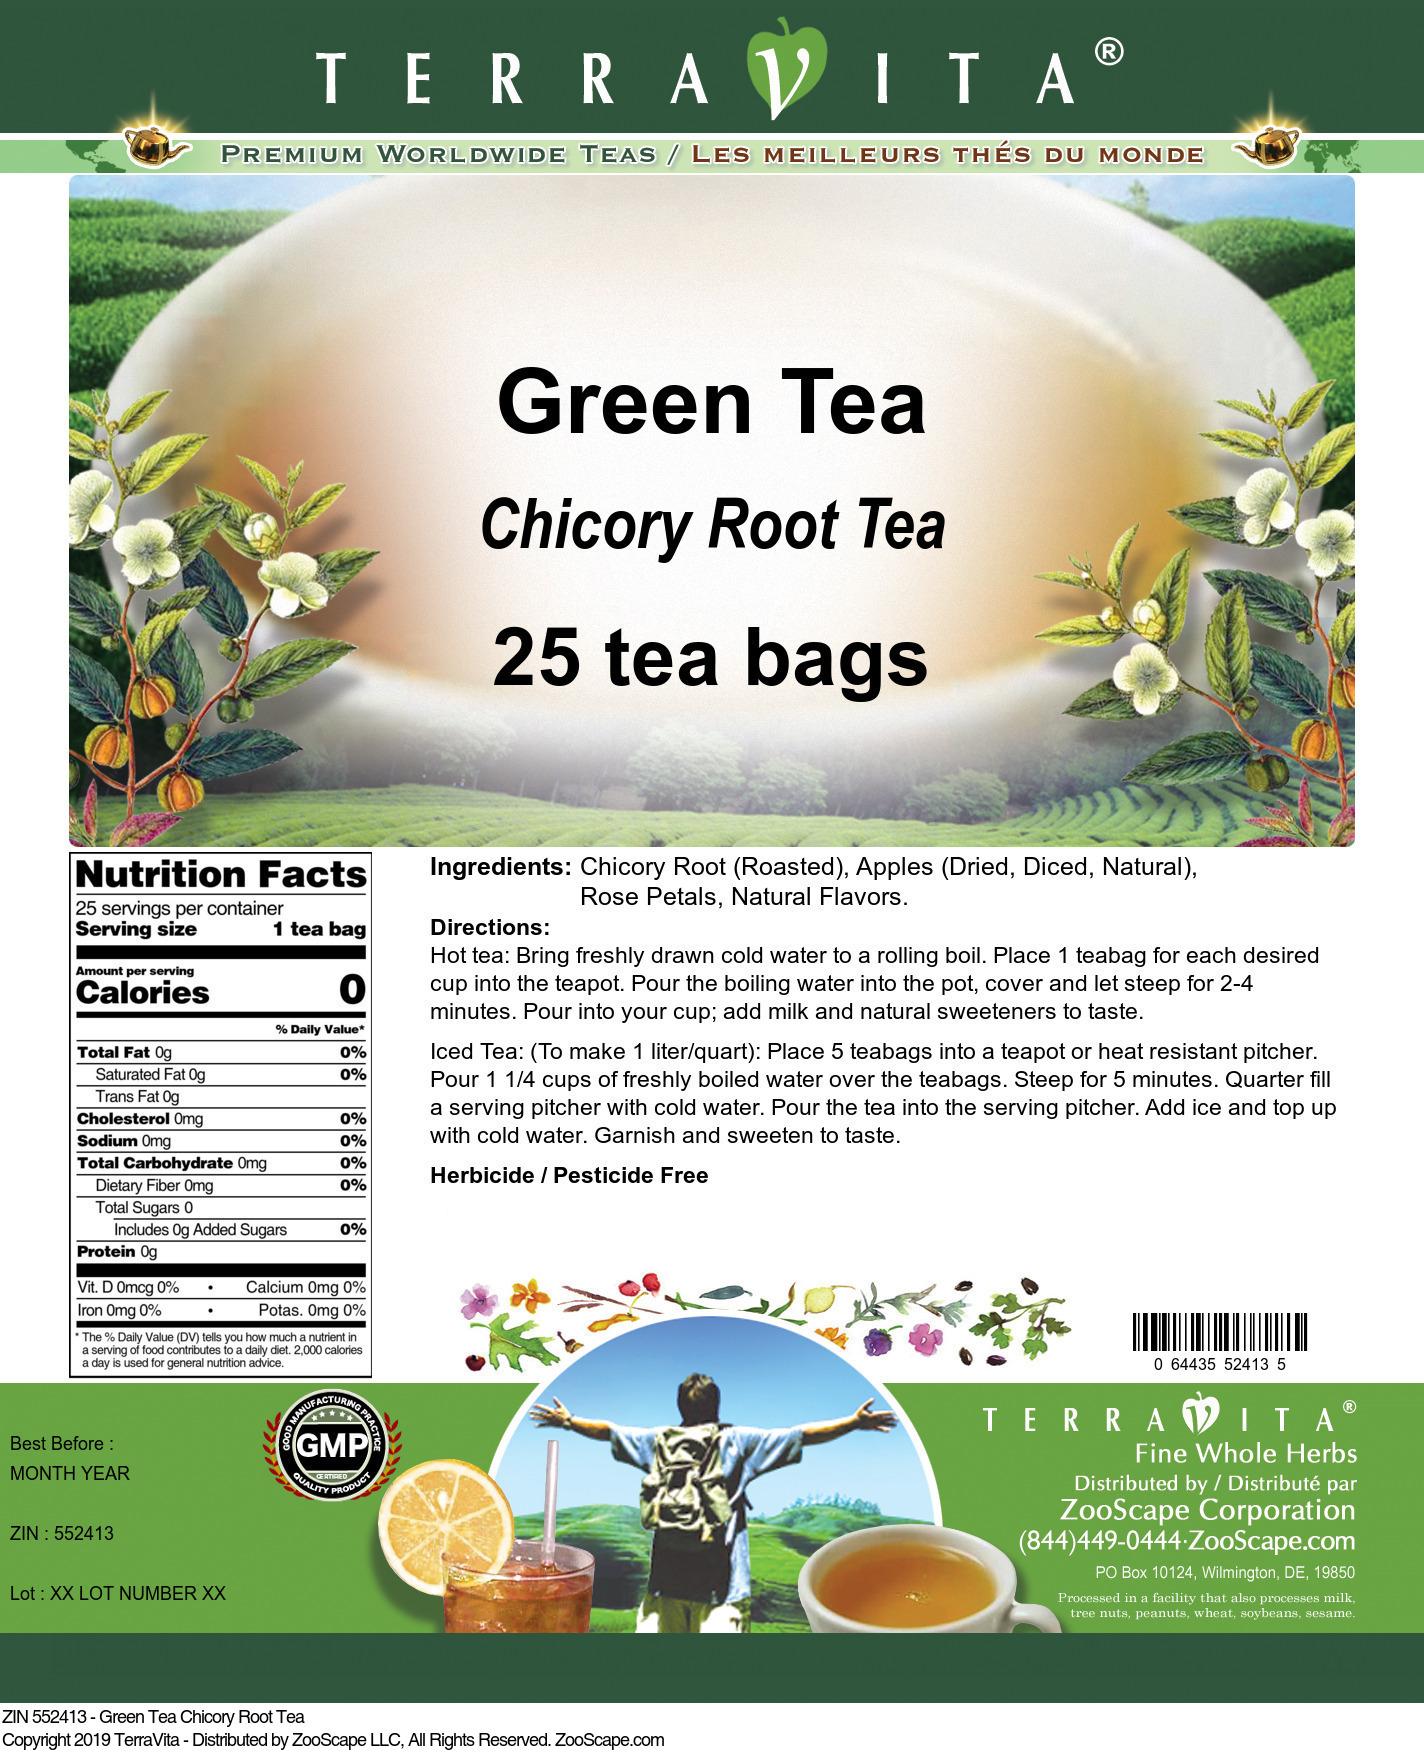 Green Tea Chicory Root